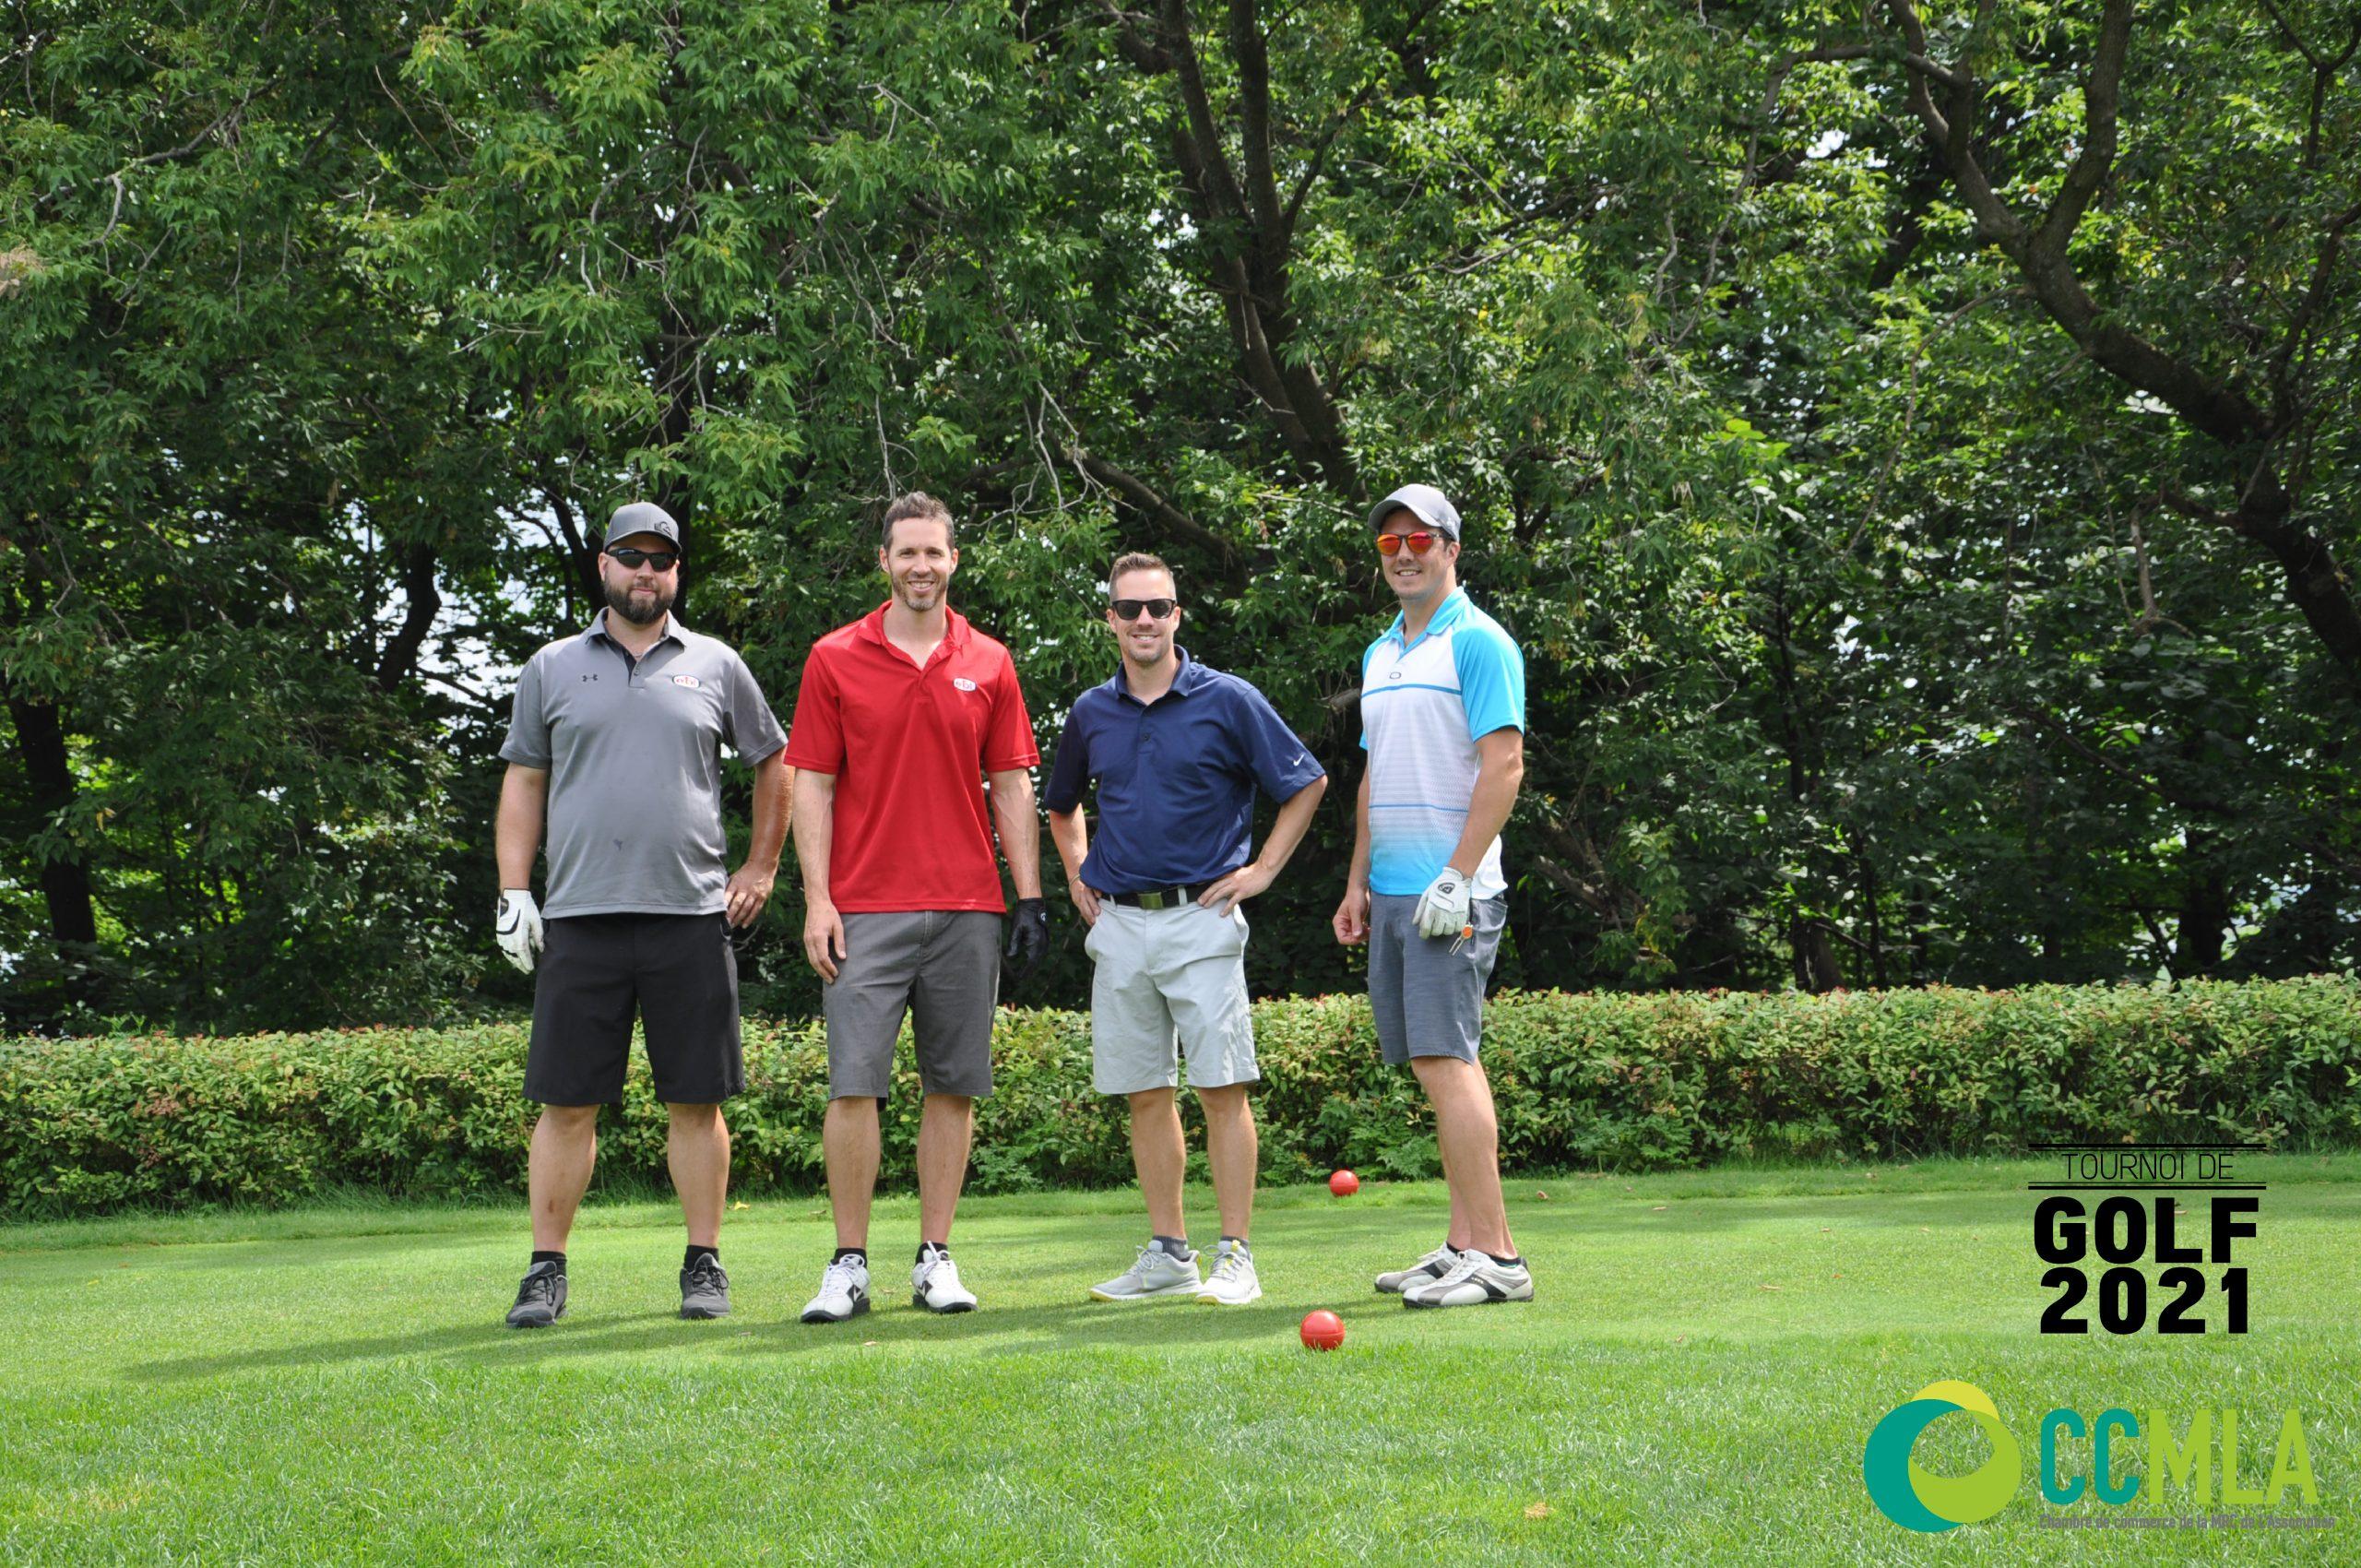 Golf2021 - Quatuors20